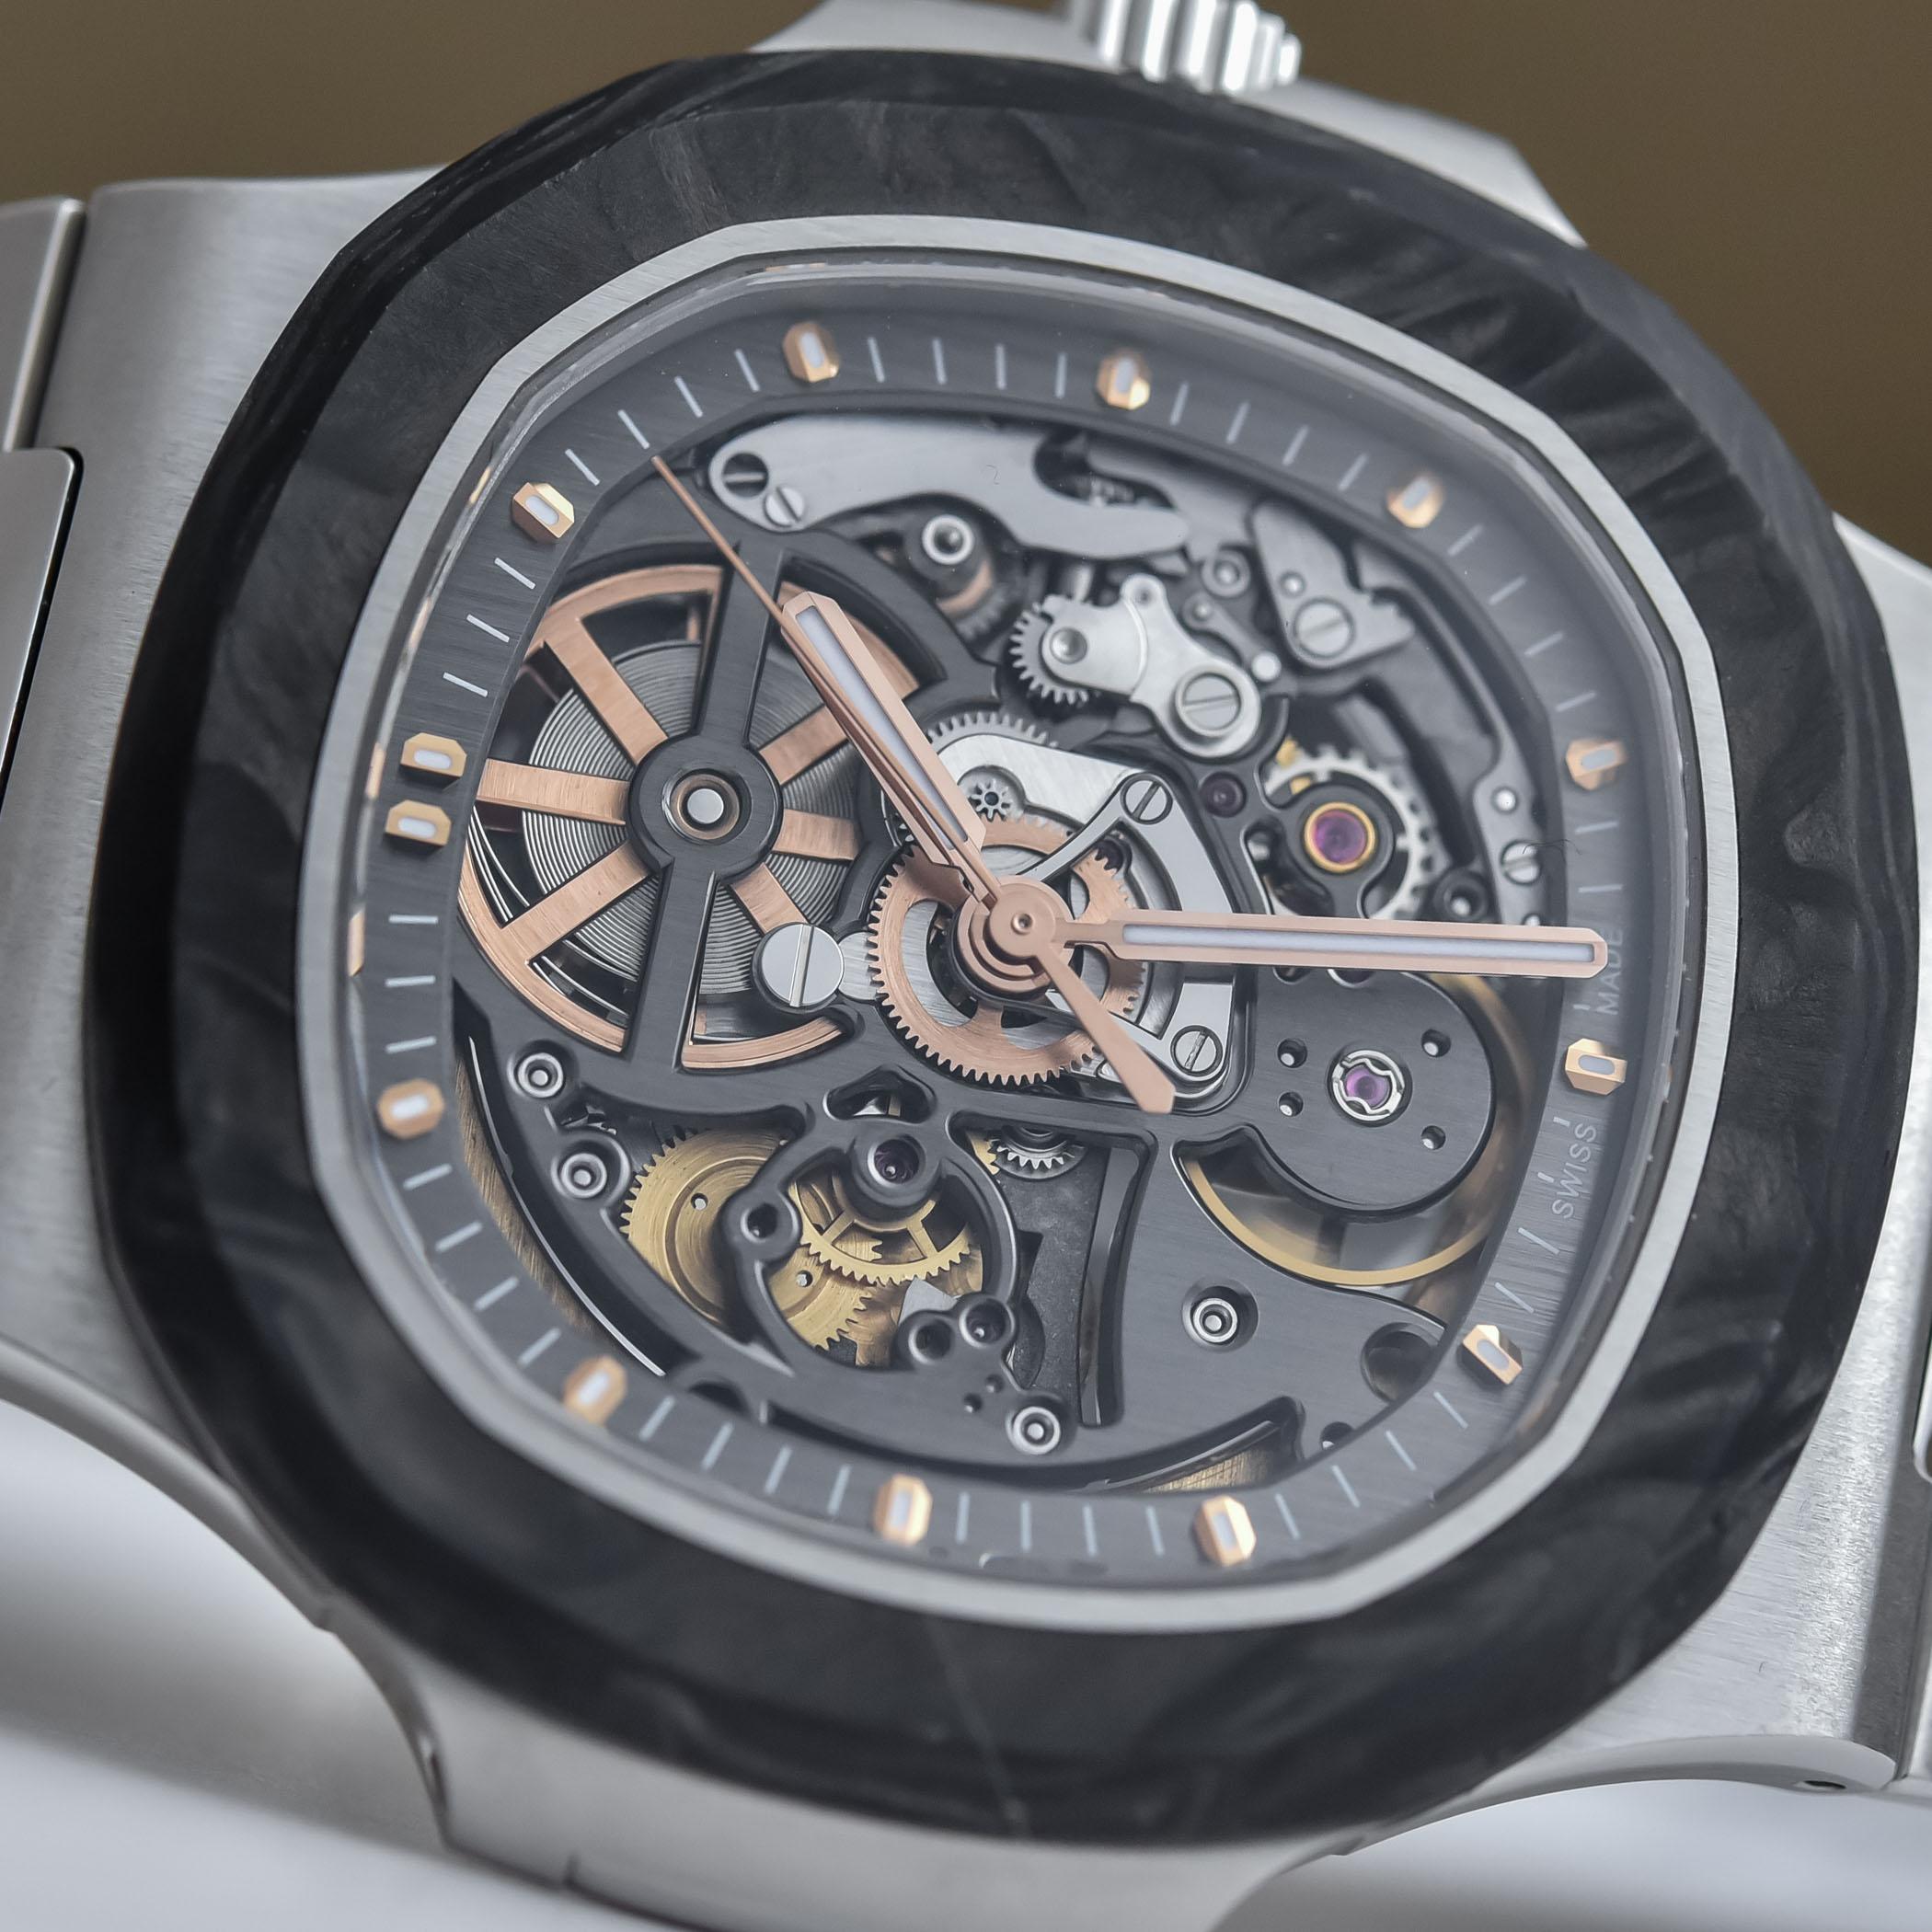 Artisans-de-Genève-The-Pearl-Project-Skeletonised-Patek-philippe-Nautilus-5711-2